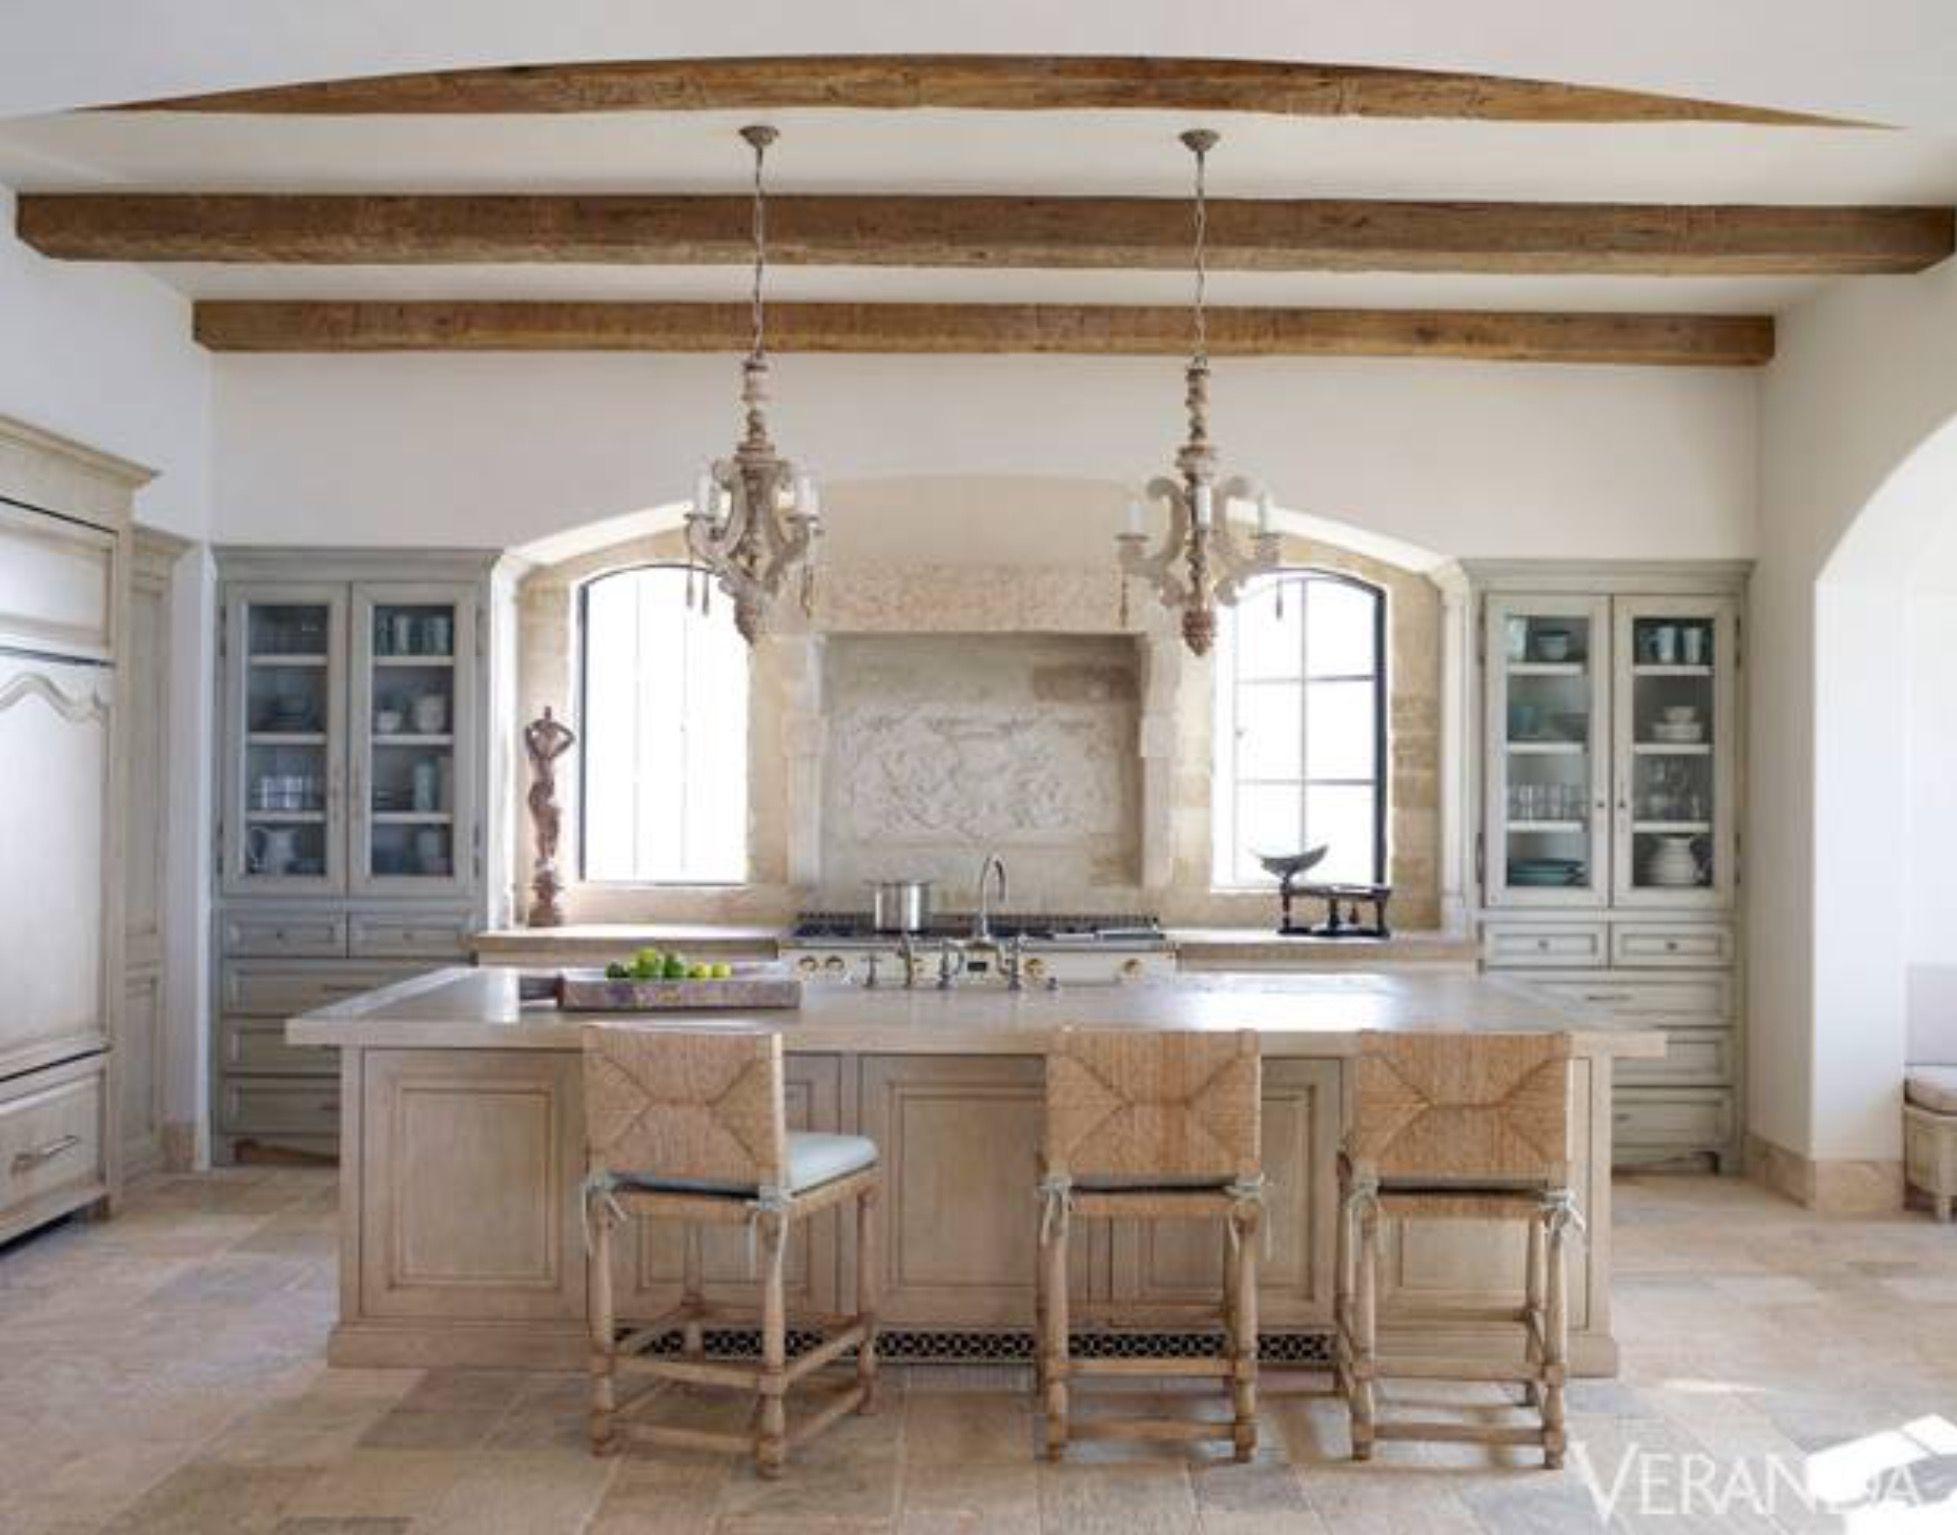 Pin de Carol Ray en Kitchens | Pinterest | Ideas para casa, Ideas ...